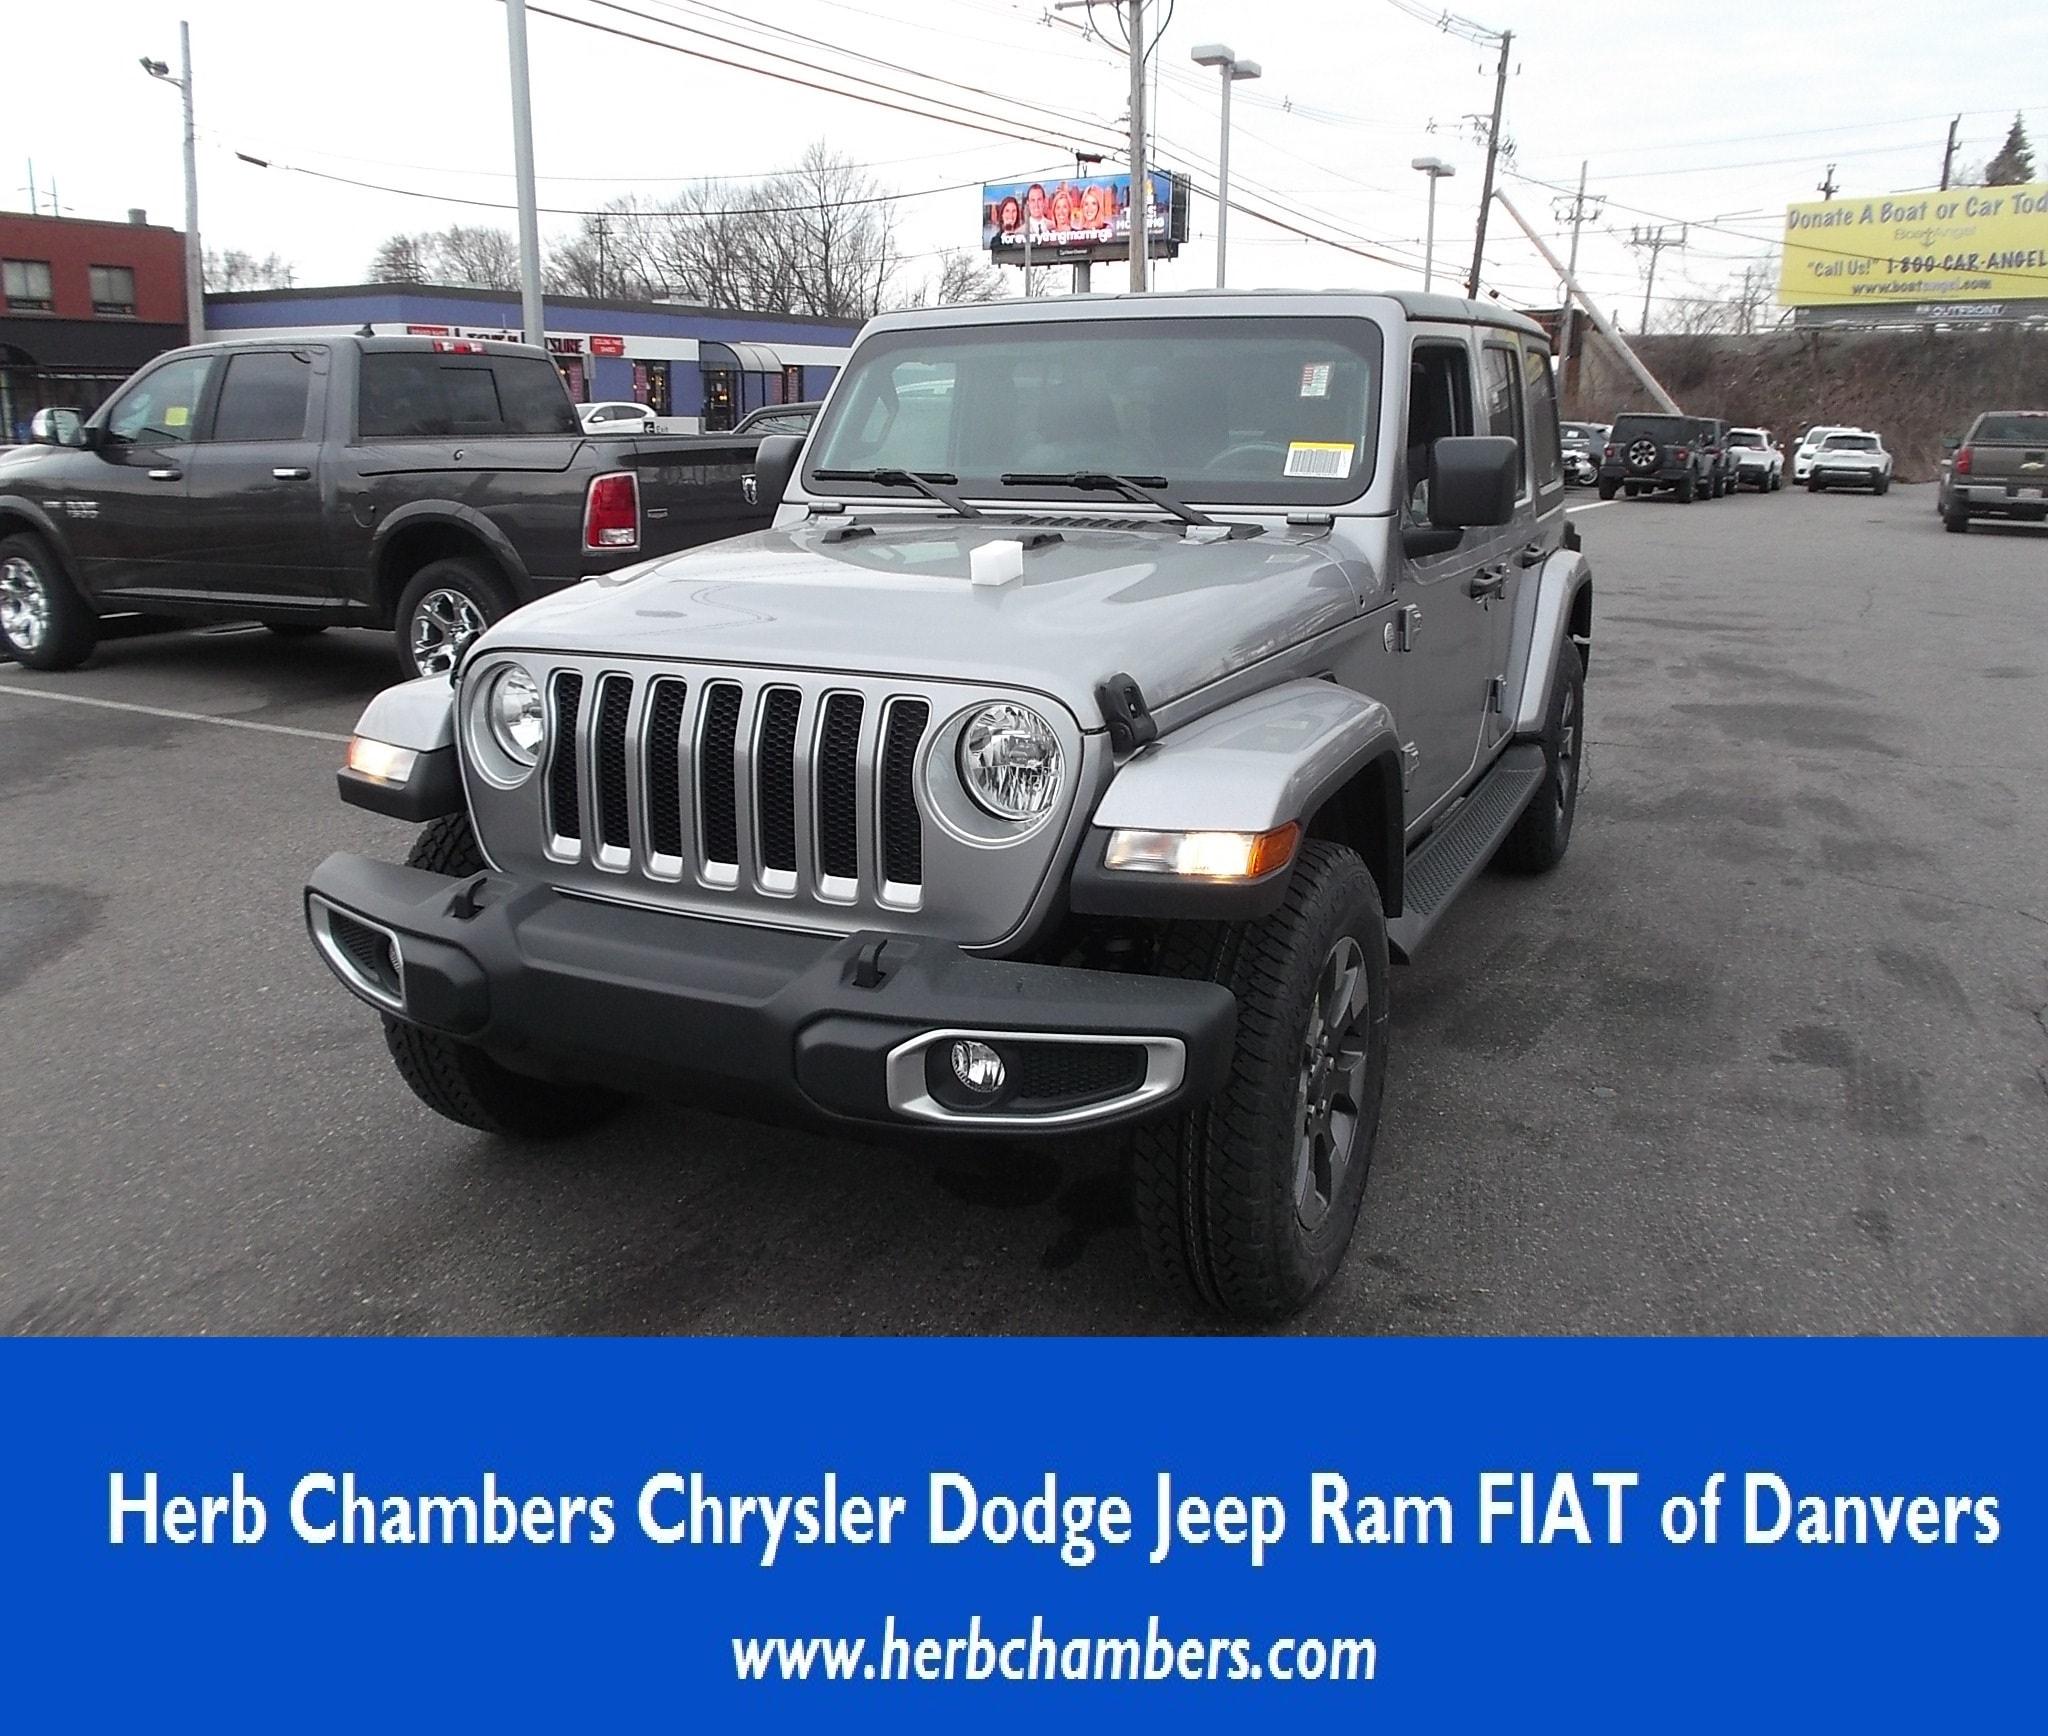 Jeep Wrangler in Danvers MA